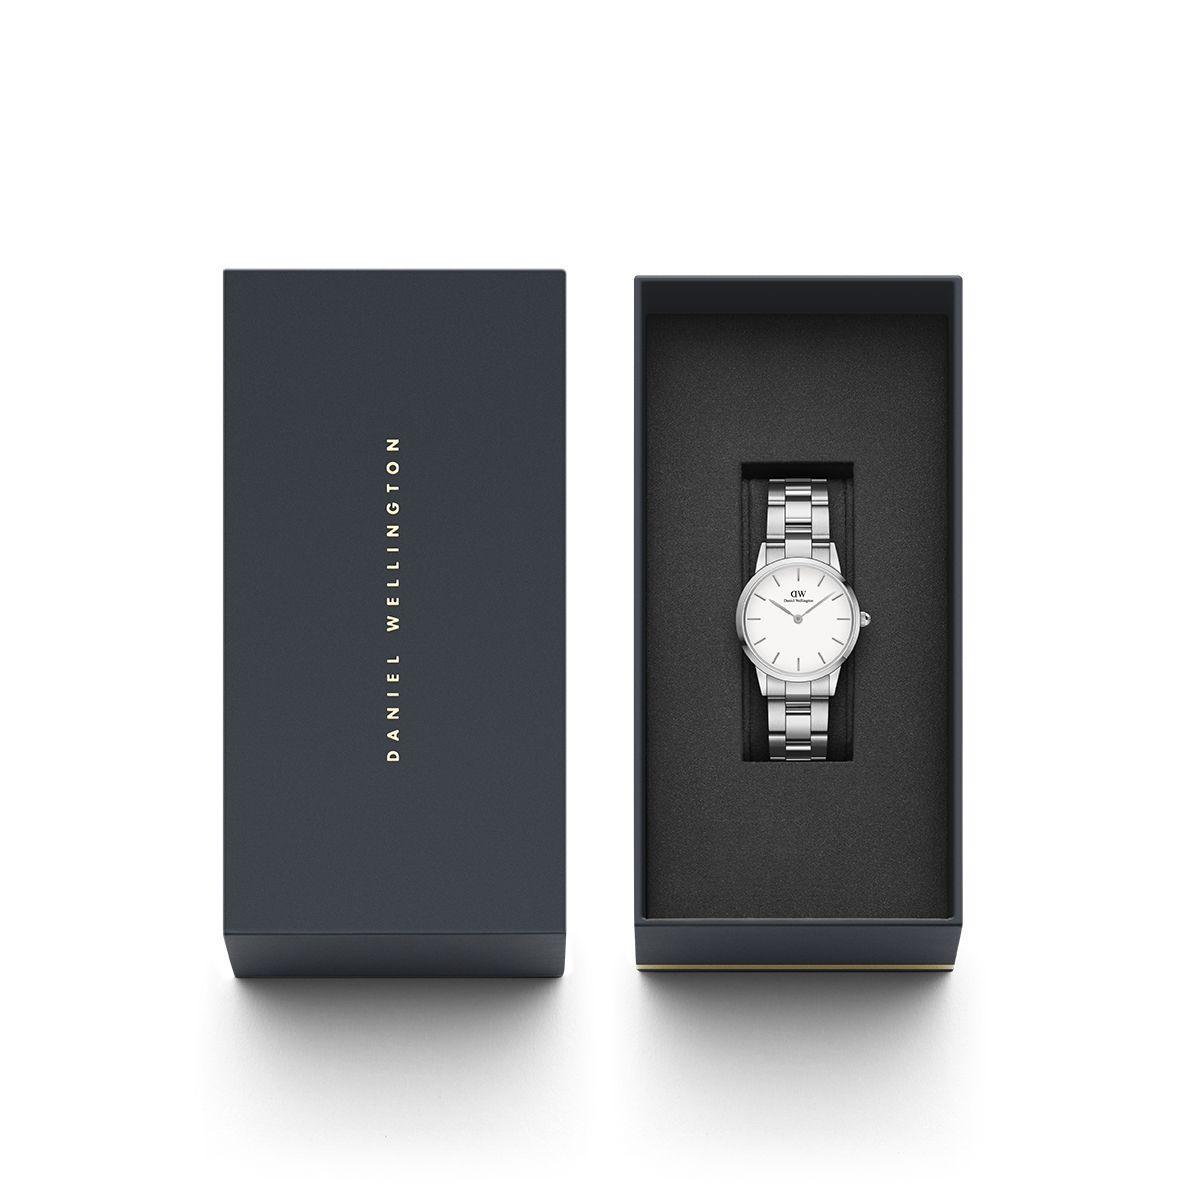 dw官网 dw手表官网 dw中国官网 dw官方旗舰店 DW DW官网  Watch Iconic Link Silver 28mm